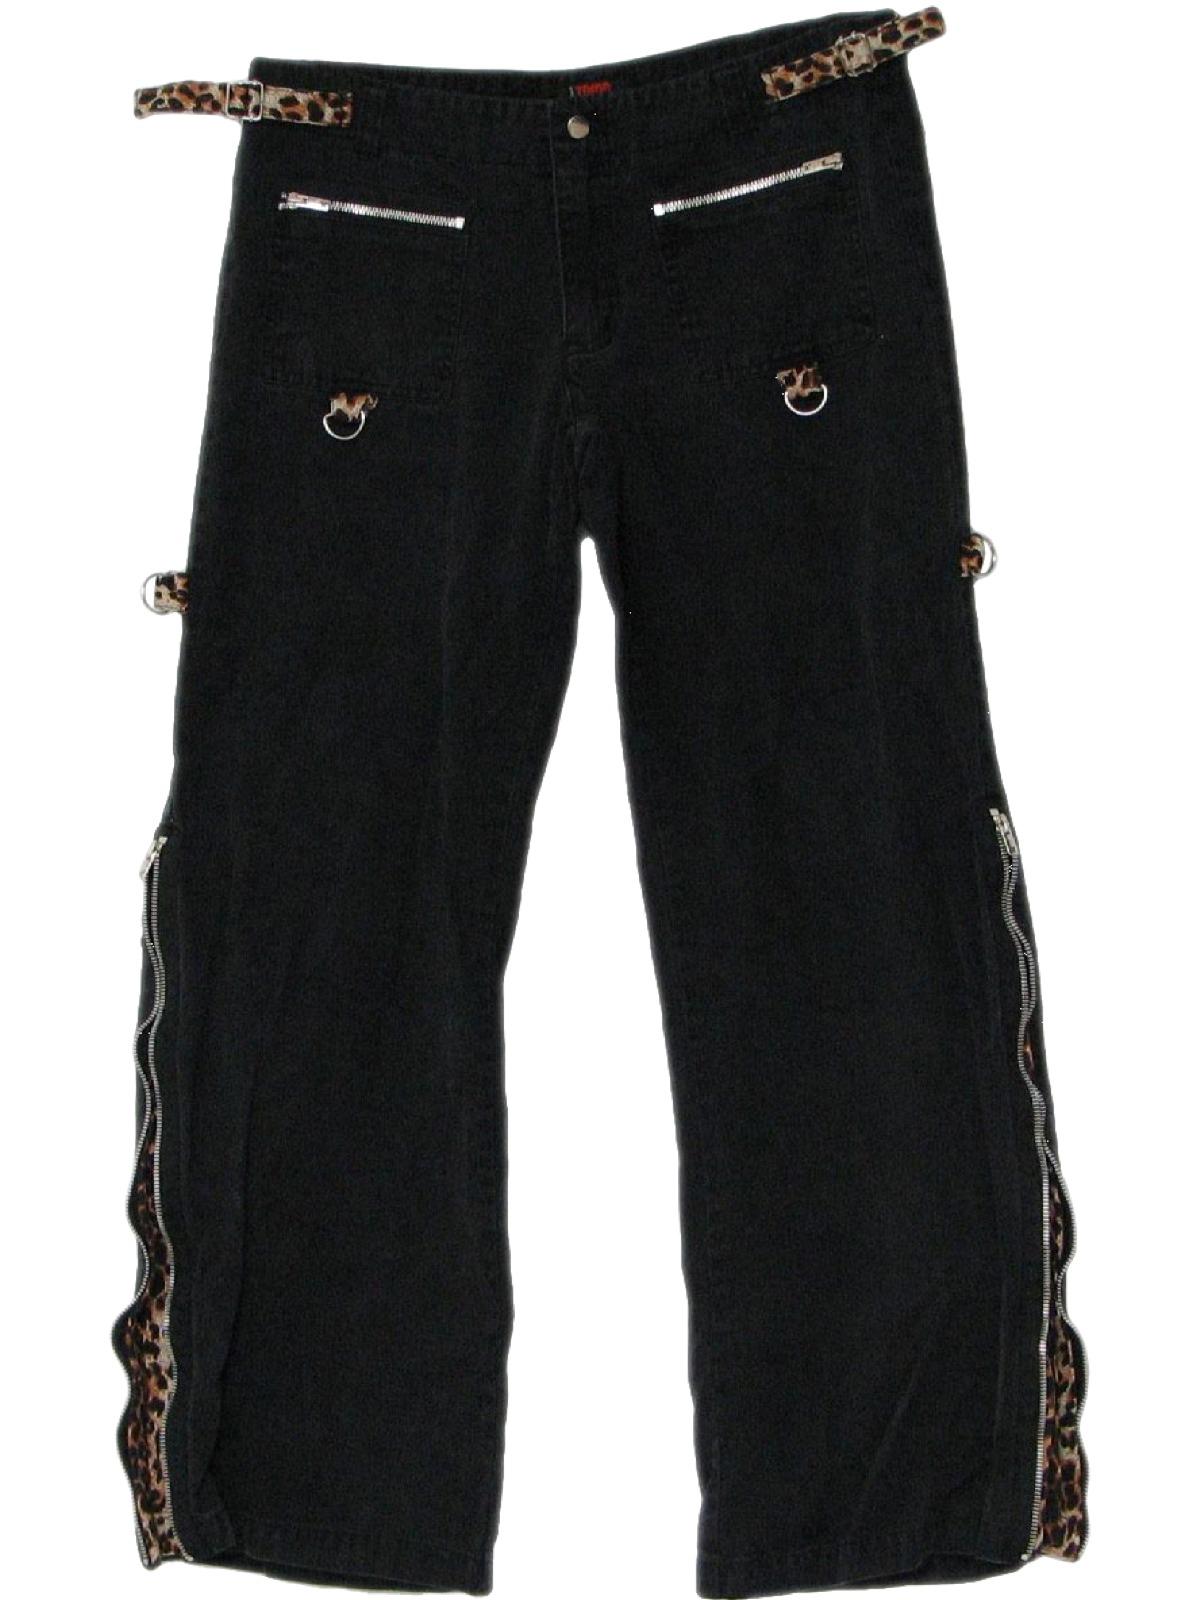 Elegant TRIPP NYC BONDAGE GOTHIC PUNK EMO GOTH BLACK PANTS AF267  EBay